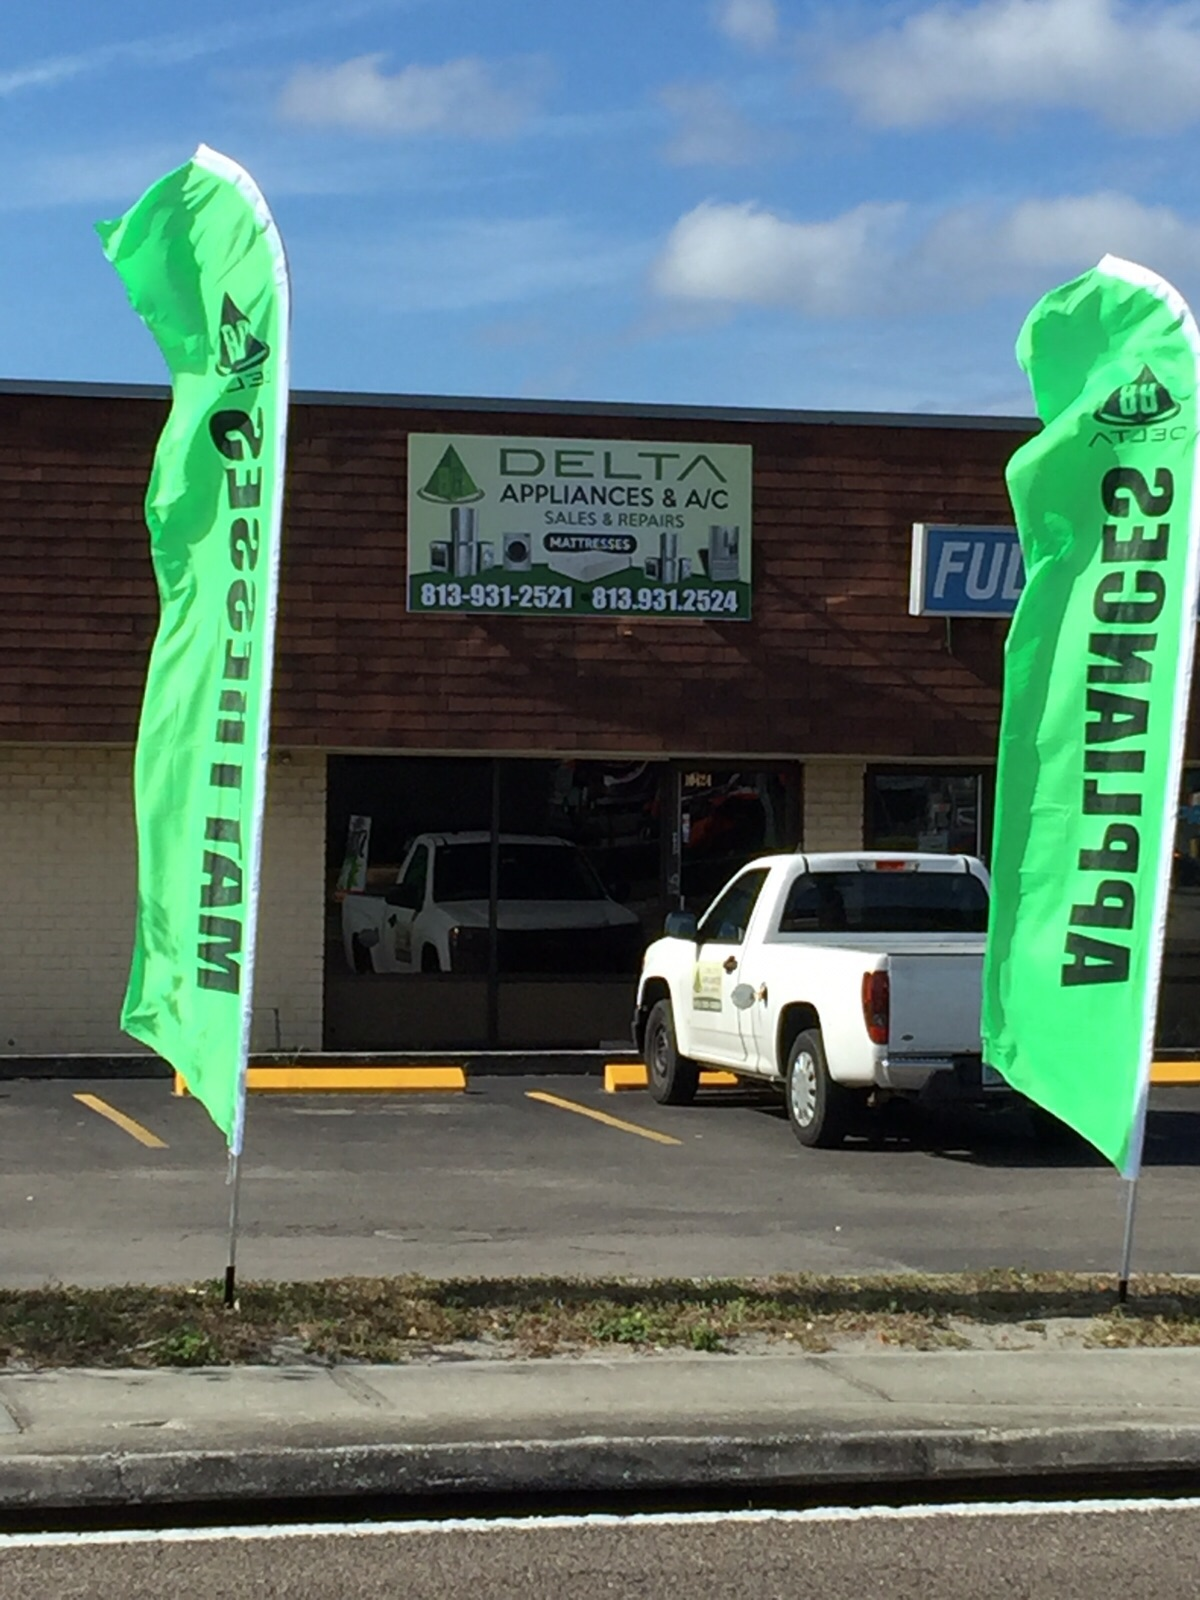 Appliances Tampa Appliance Repair Tampa Call 813 701 2335